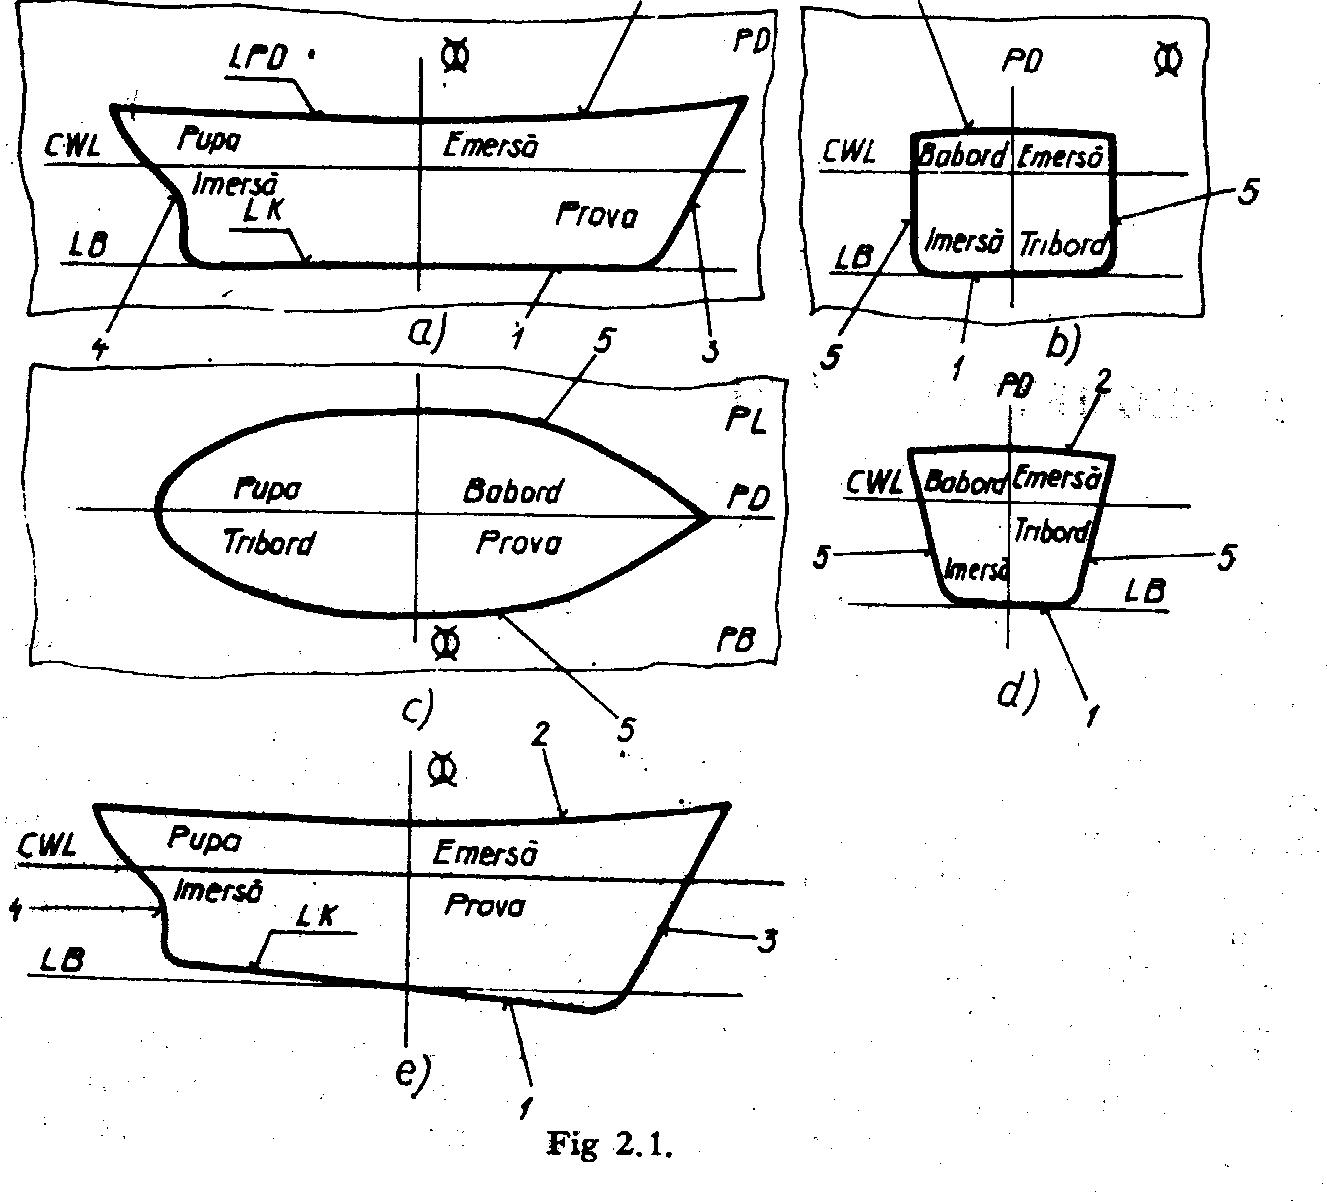 Mecanica Si Constructia Navei Referat